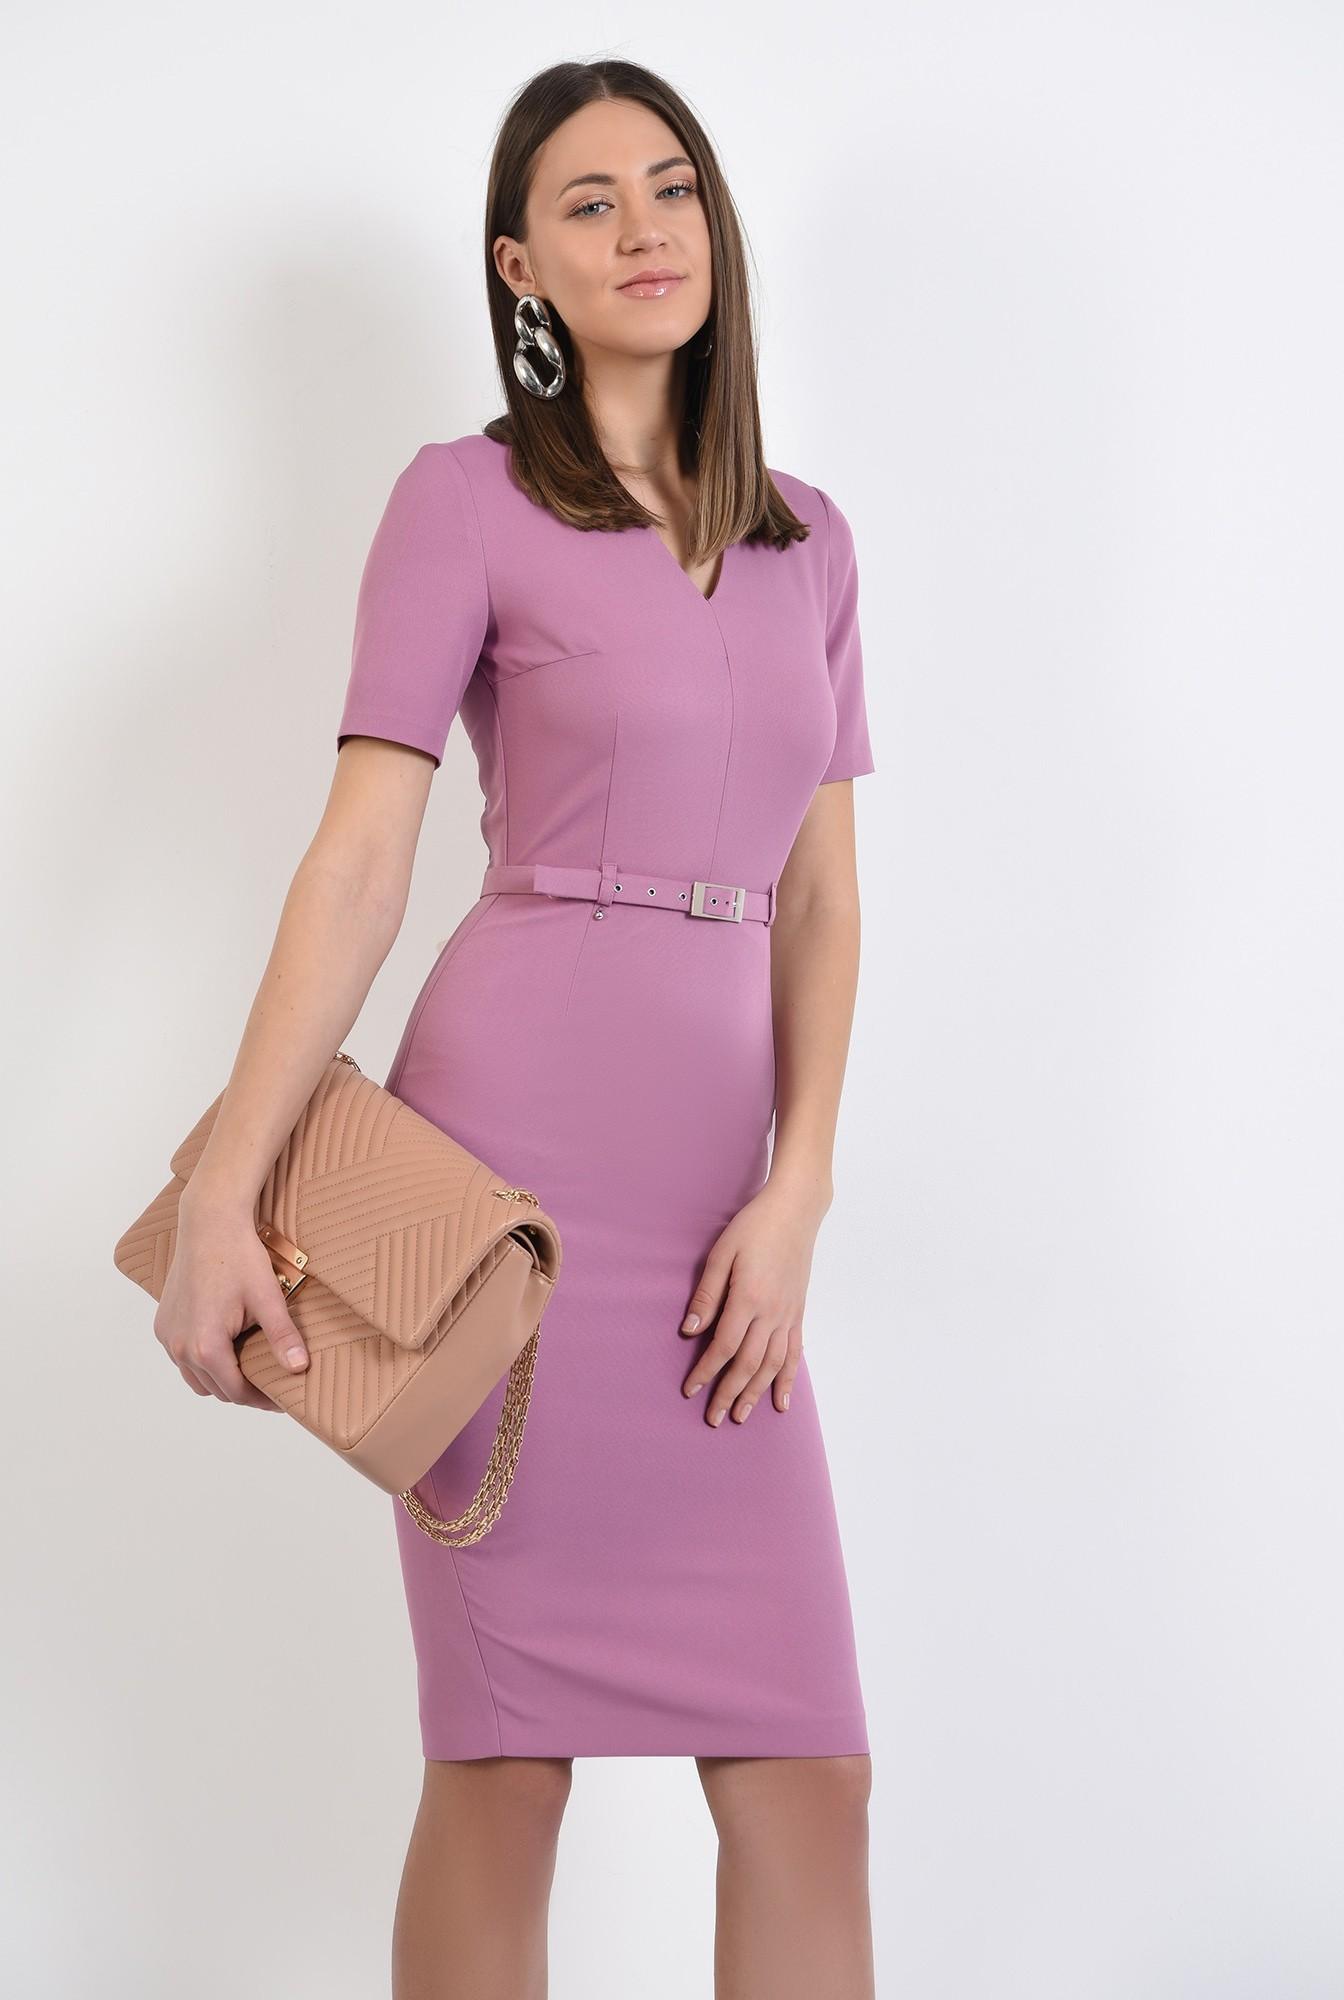 0 - rochie midi, cambrata, cu curea fina, maneci scurte, rochie office, rochie de primavara